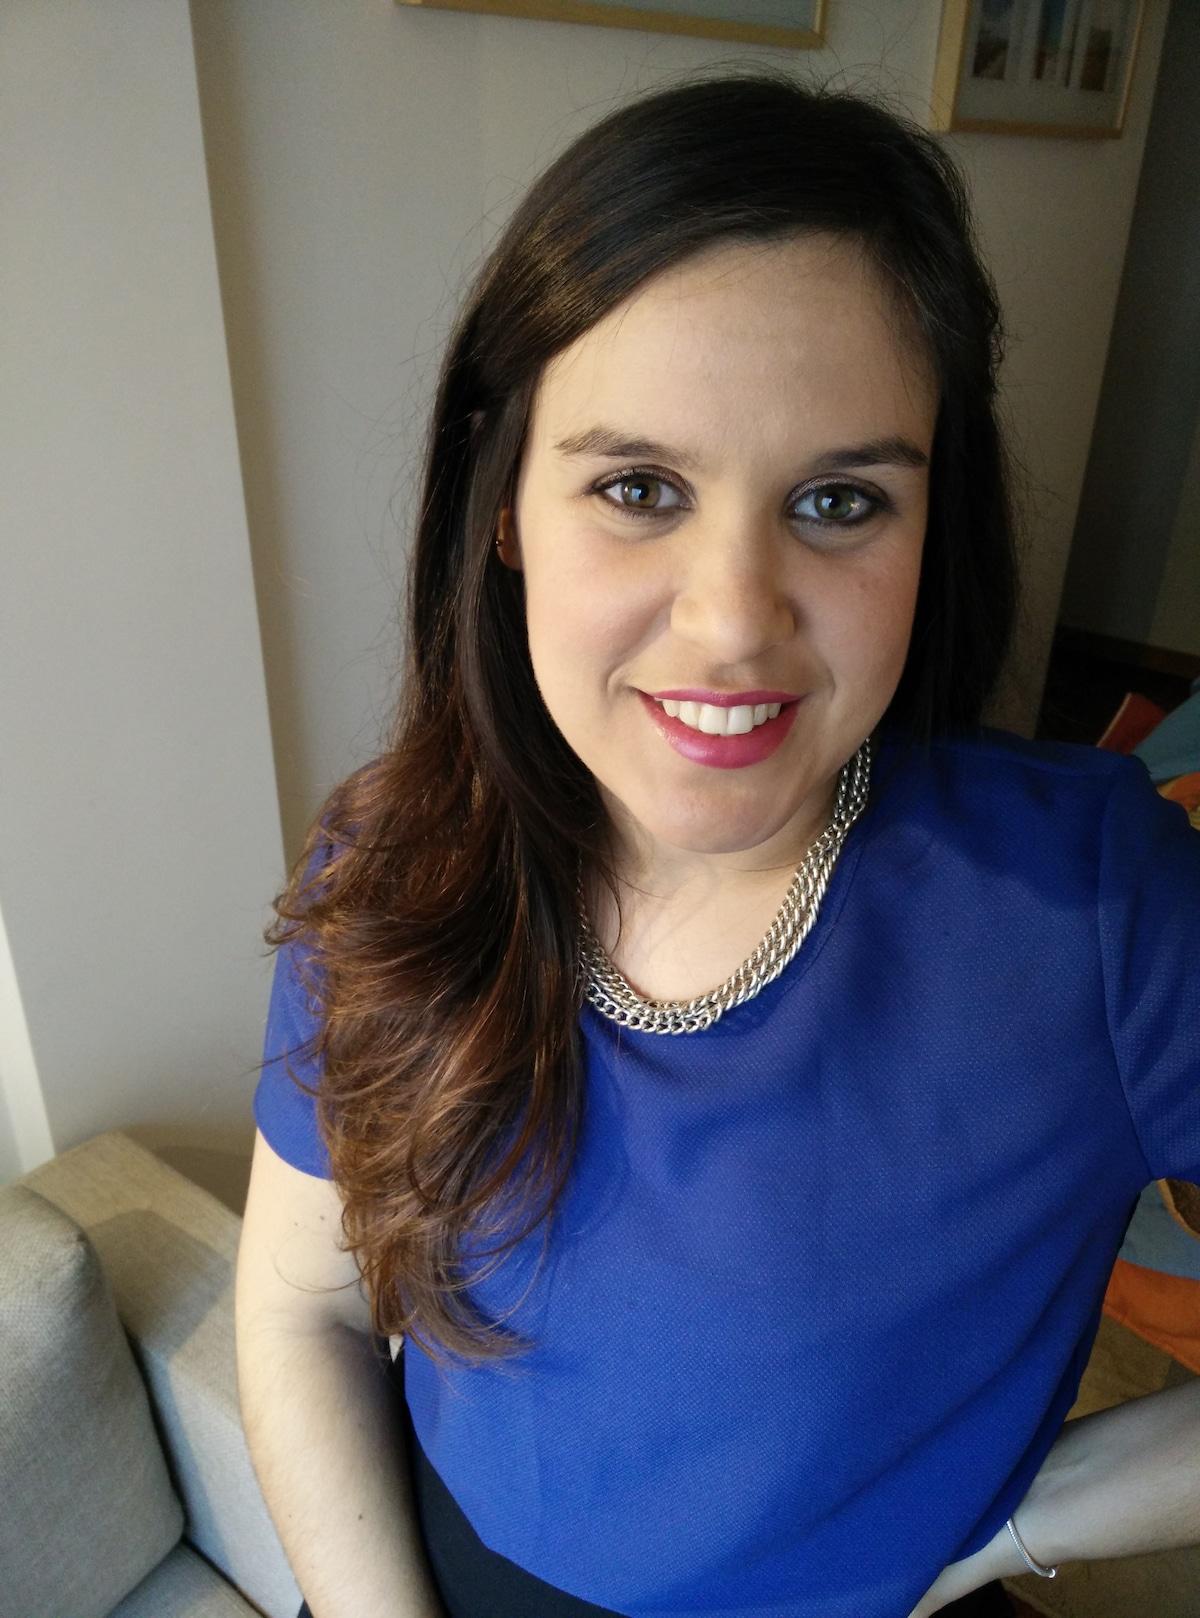 Ana Isabel from Aveiro